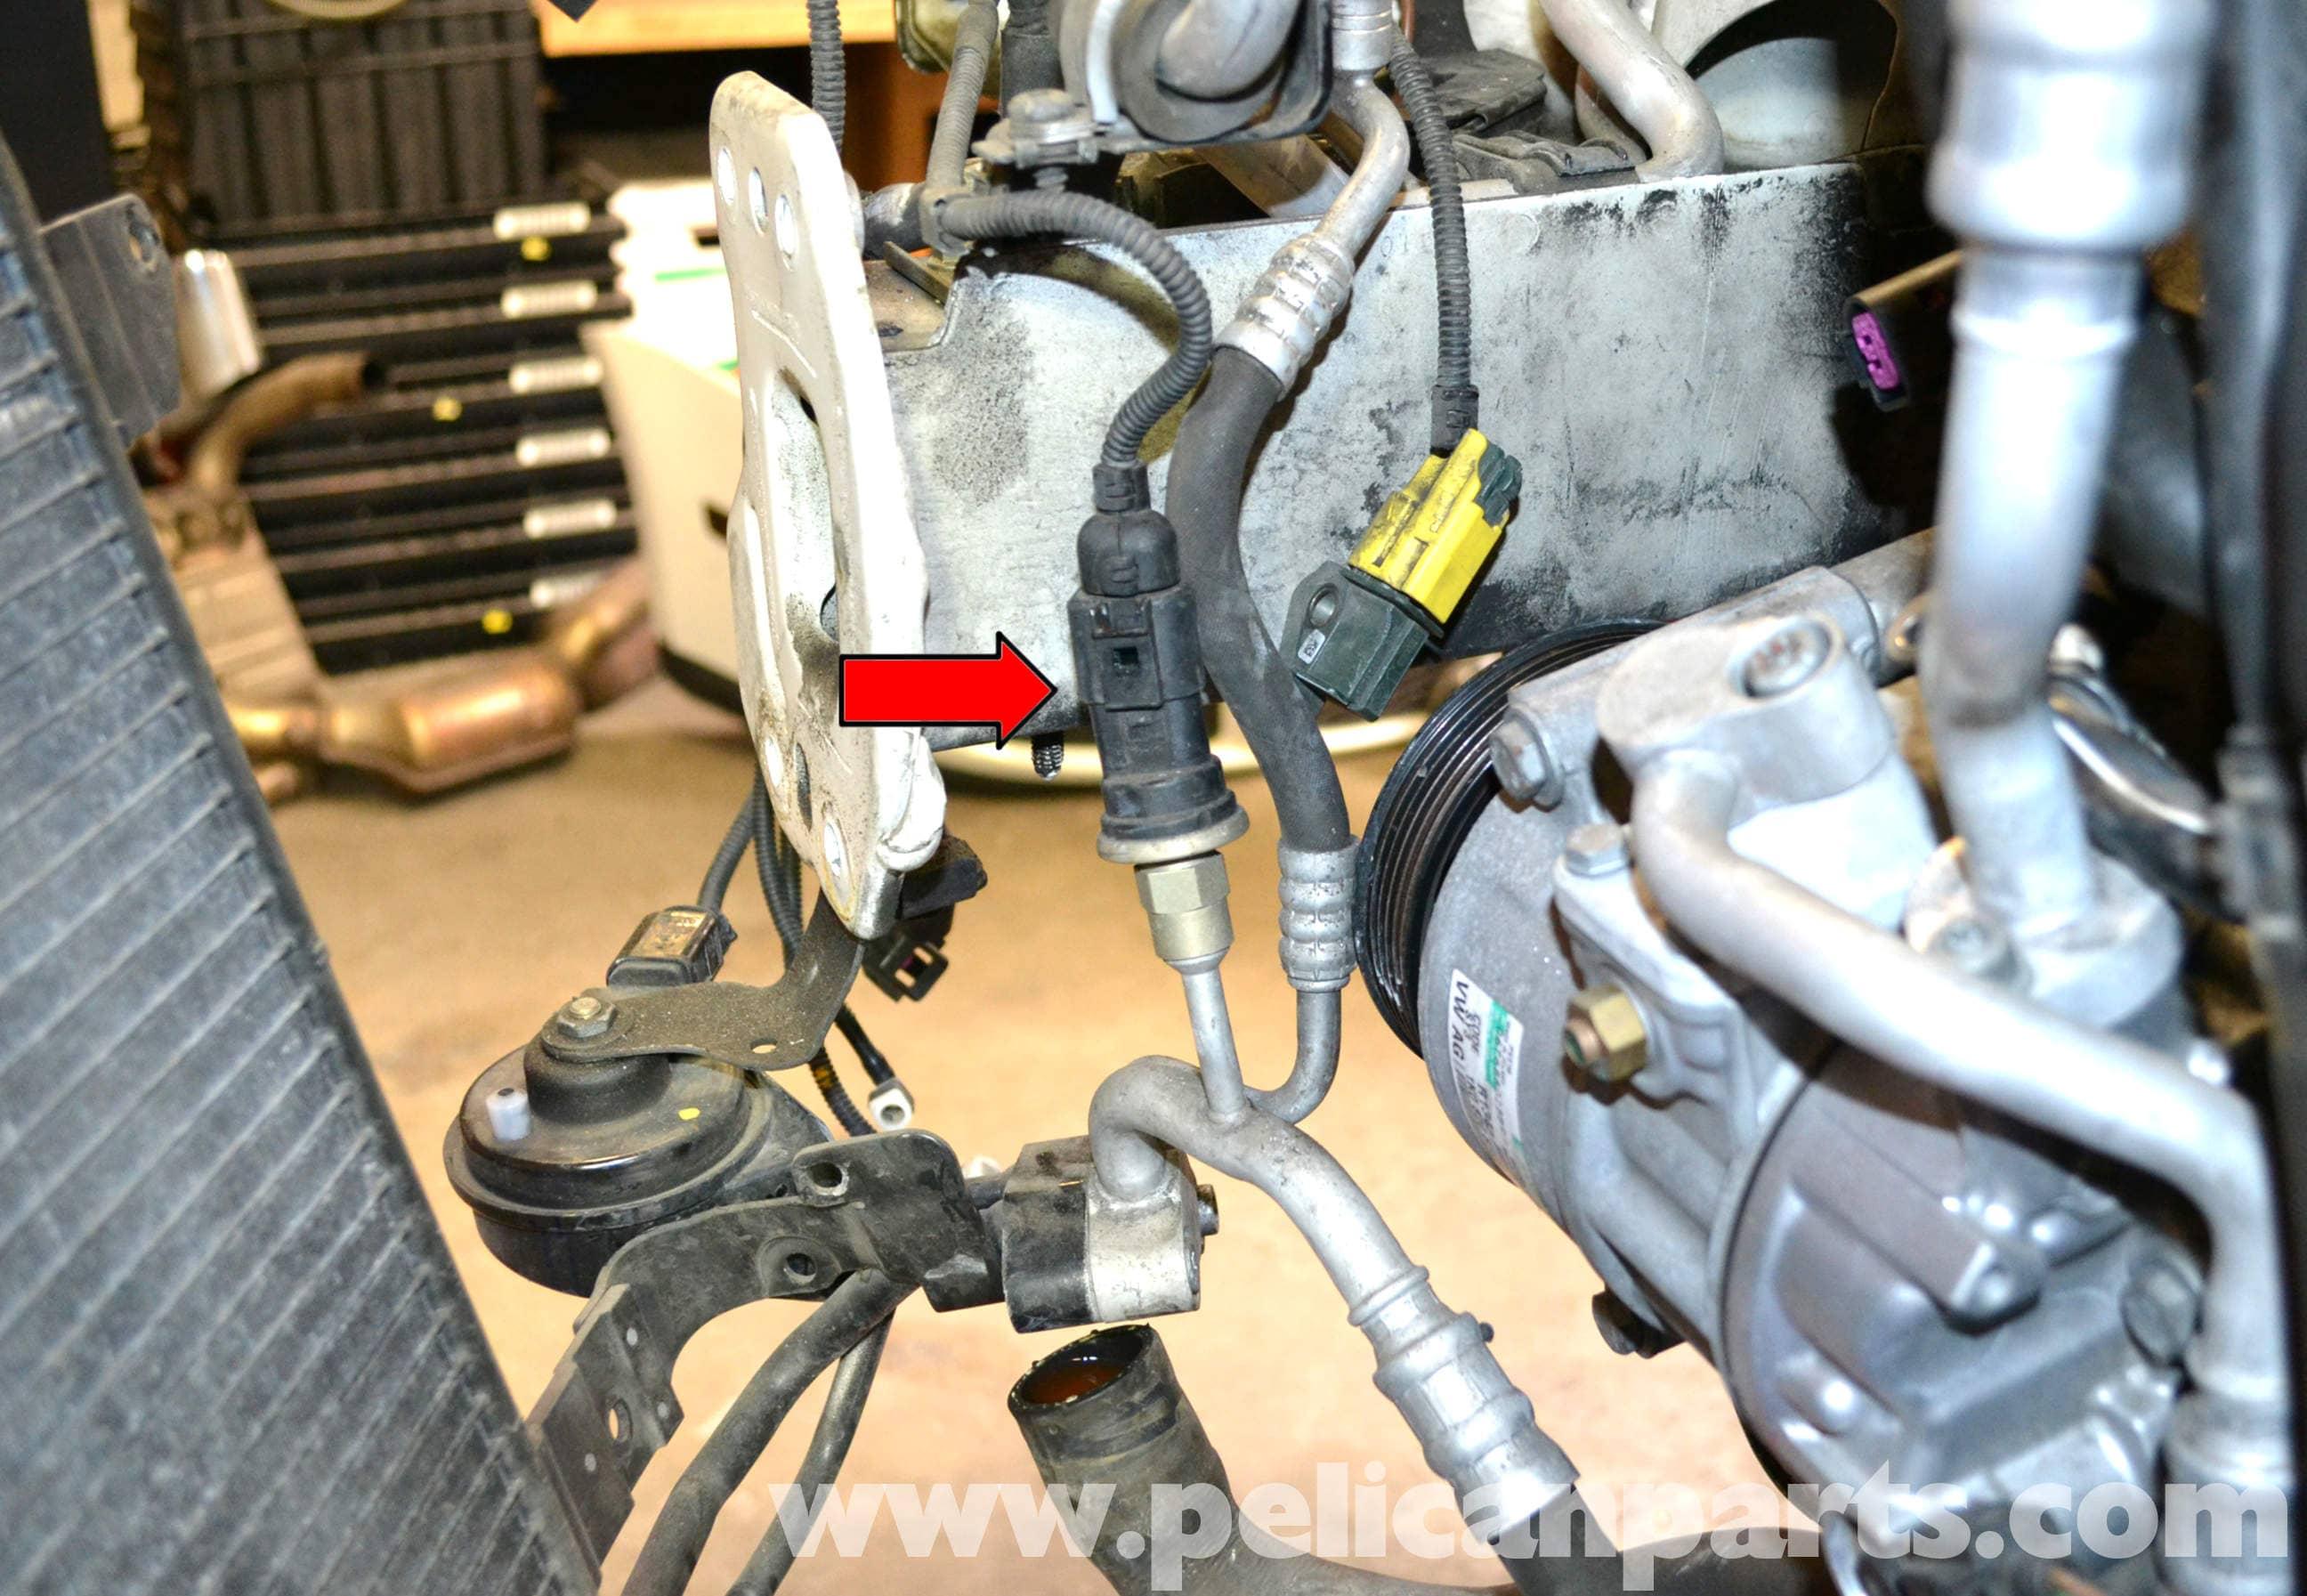 Volkswagen Golf GTI Mk V A/C Condenser and Compressor